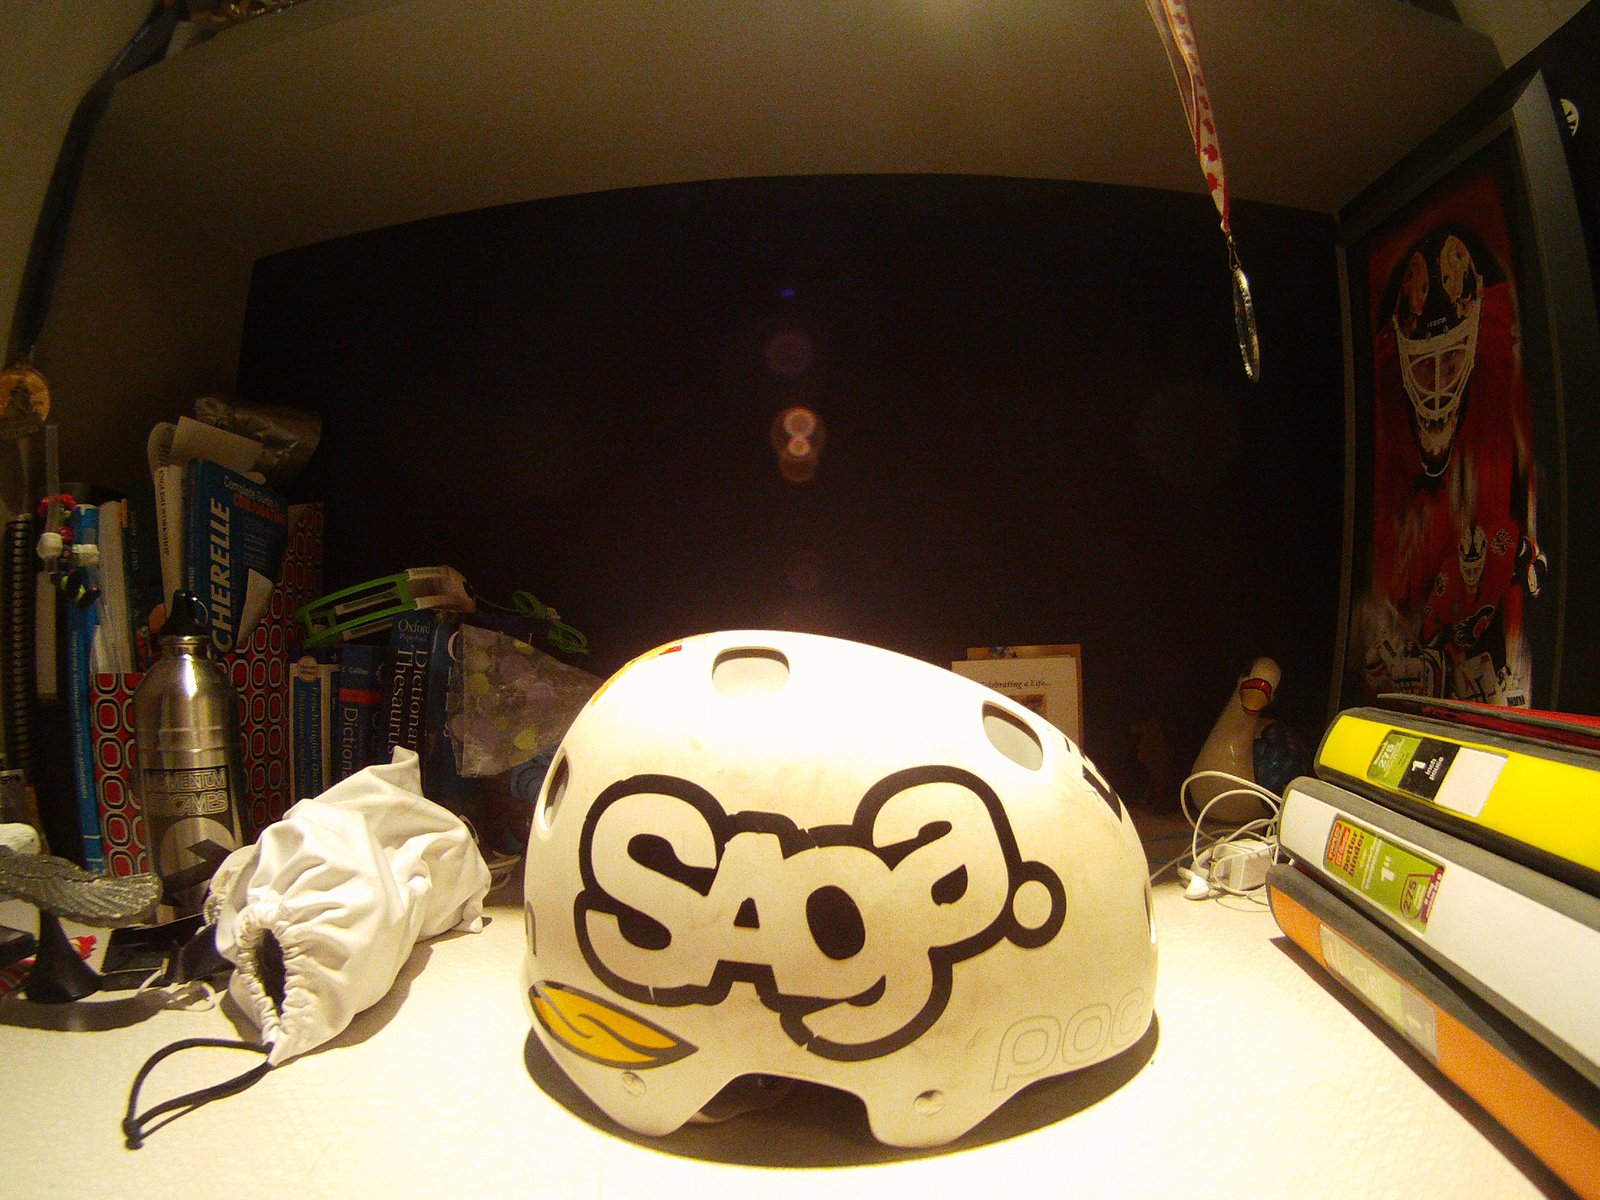 Poc helmet right side